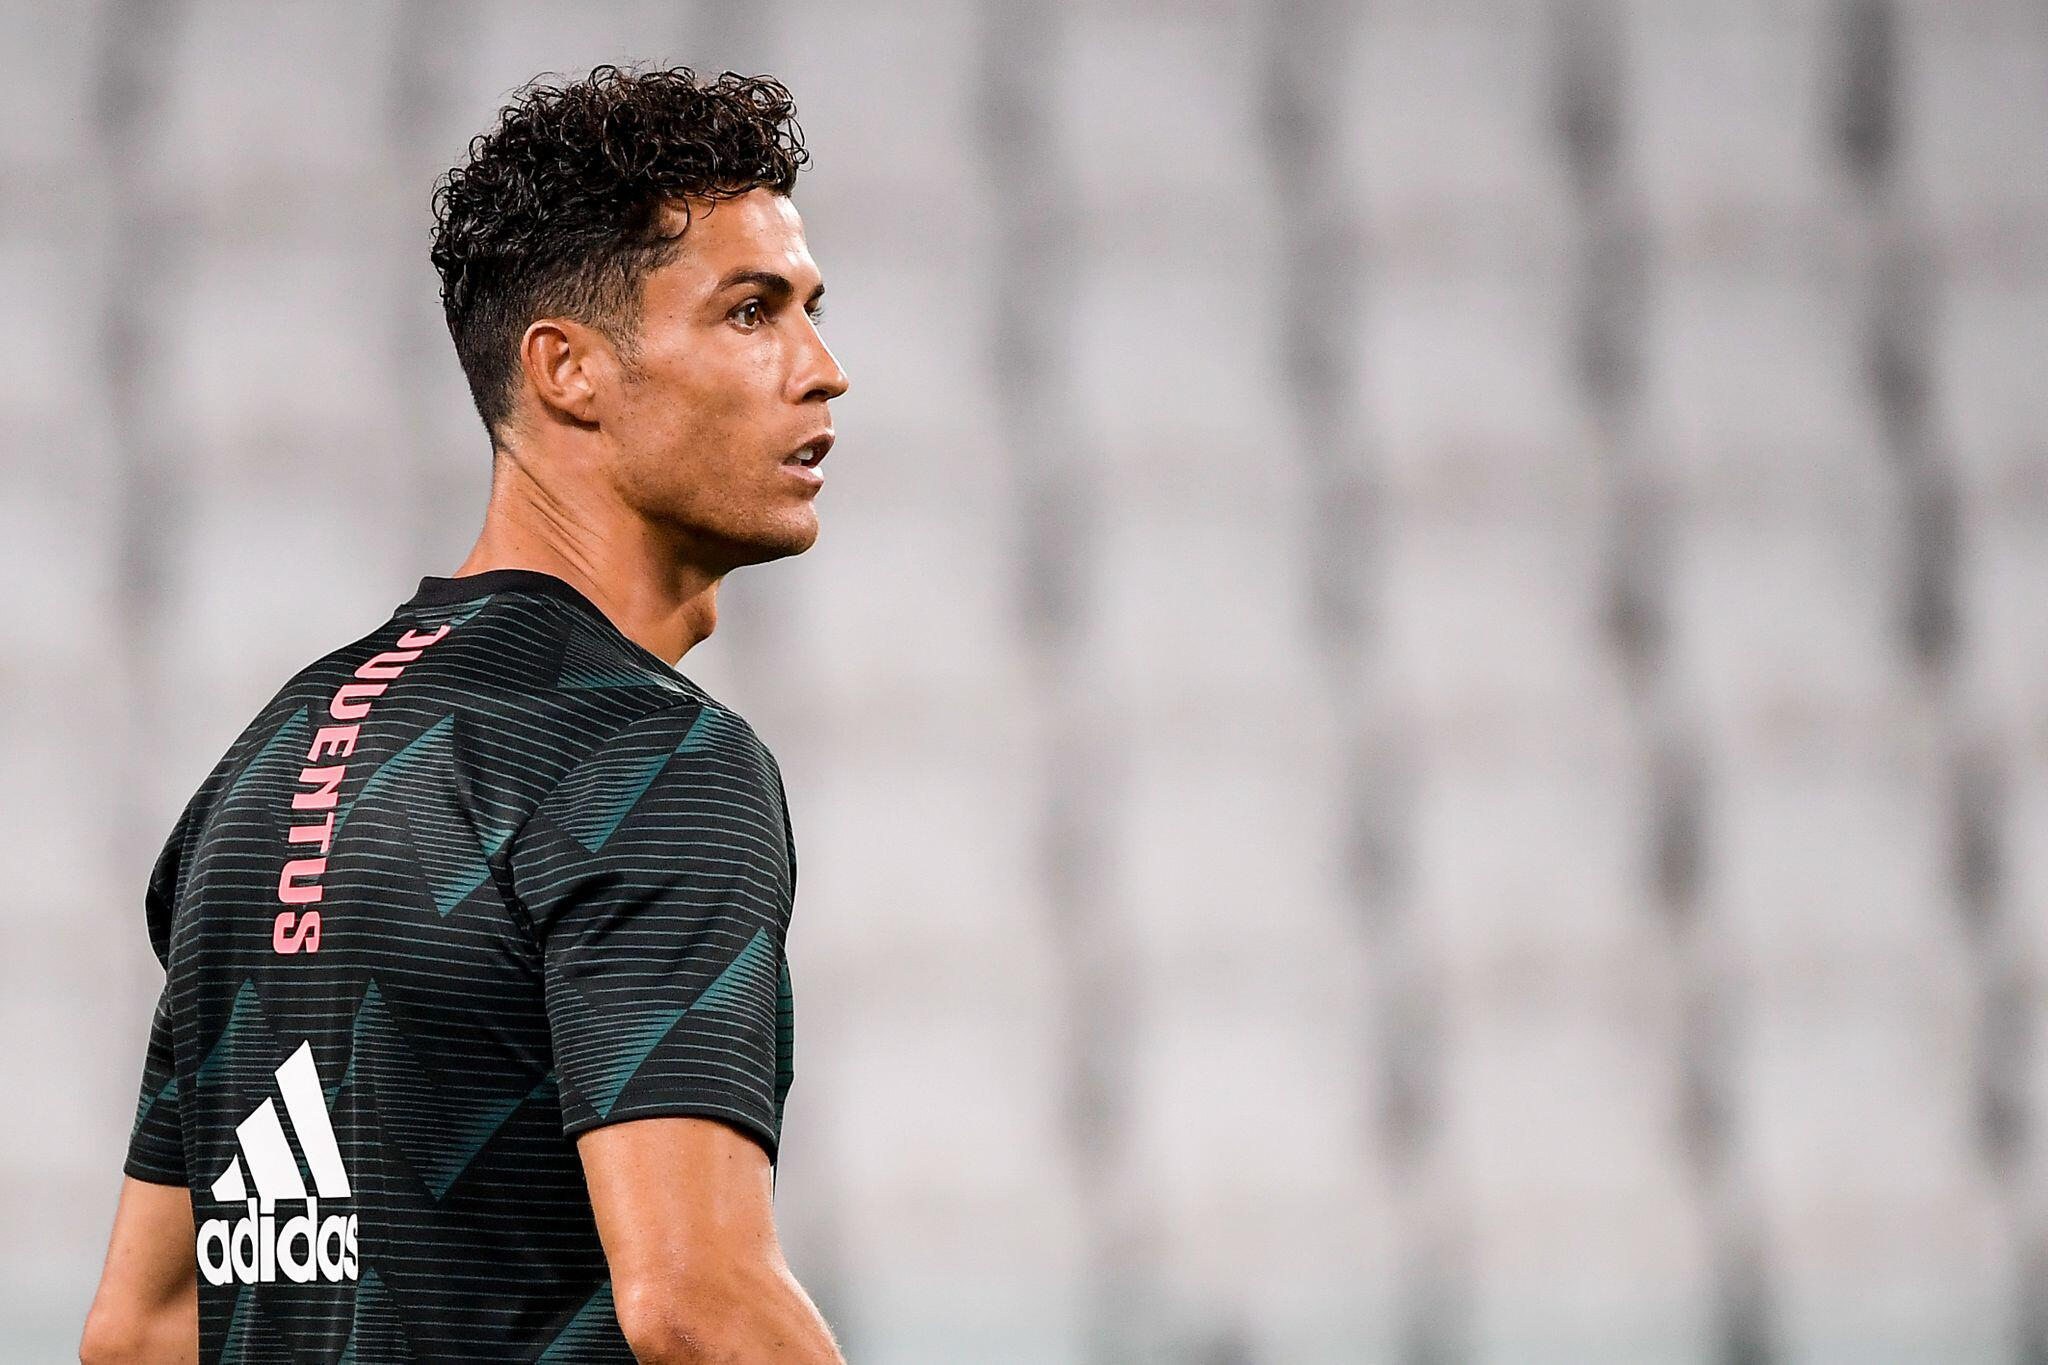 Bild zu Fußball-Superstar Cristiano Ronaldo positiv auf Coronavirus